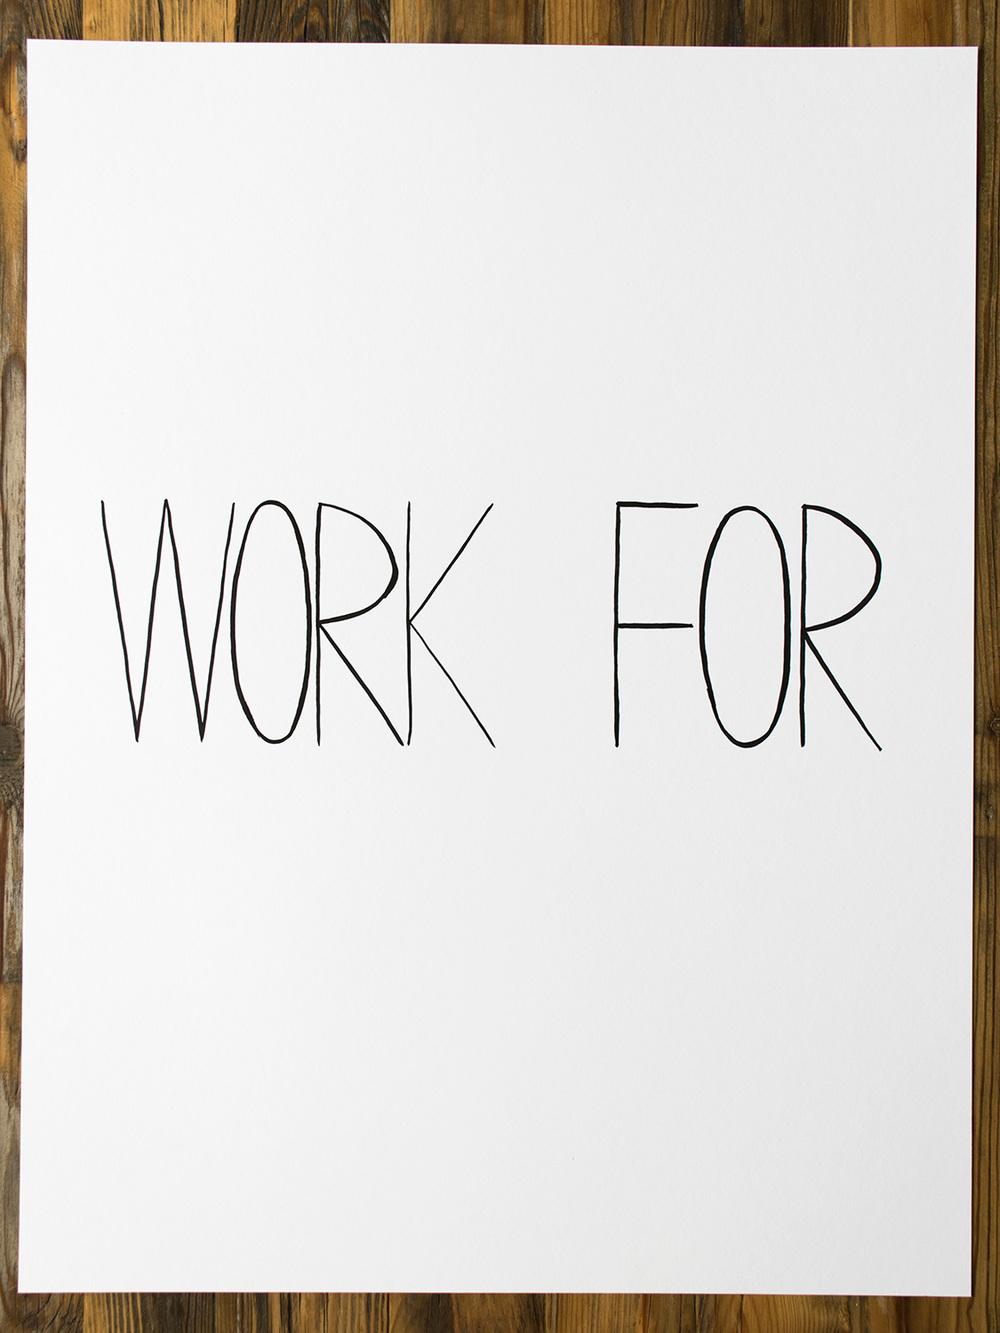 work_for-1500x1125.jpg